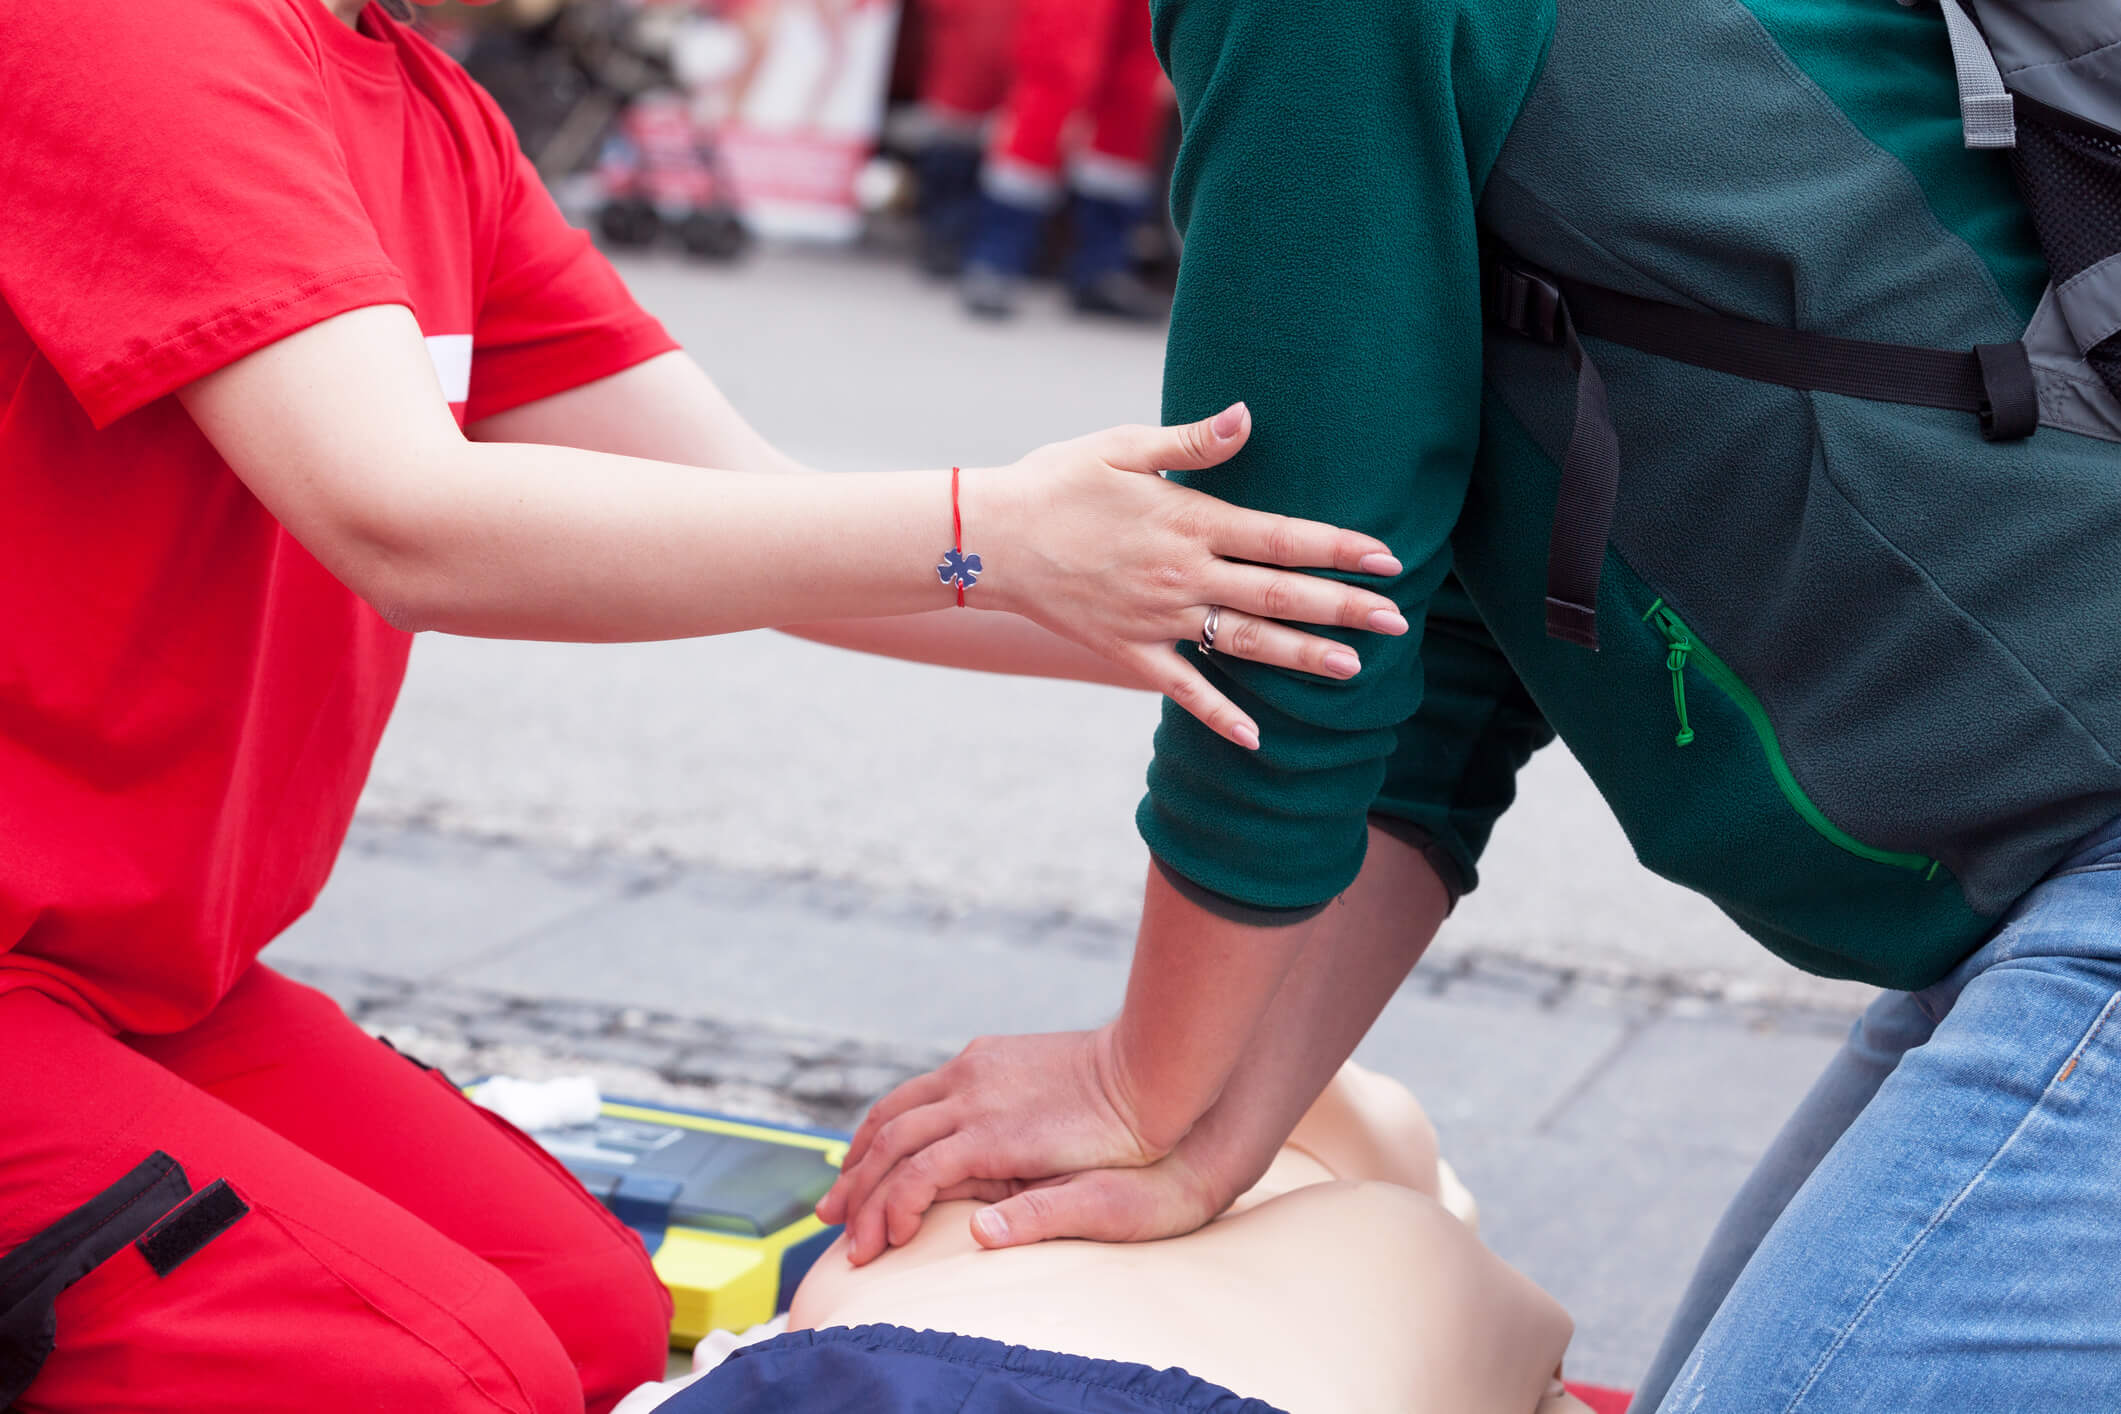 5 Injuries You May Encounter in Tactical Medical Scenarios